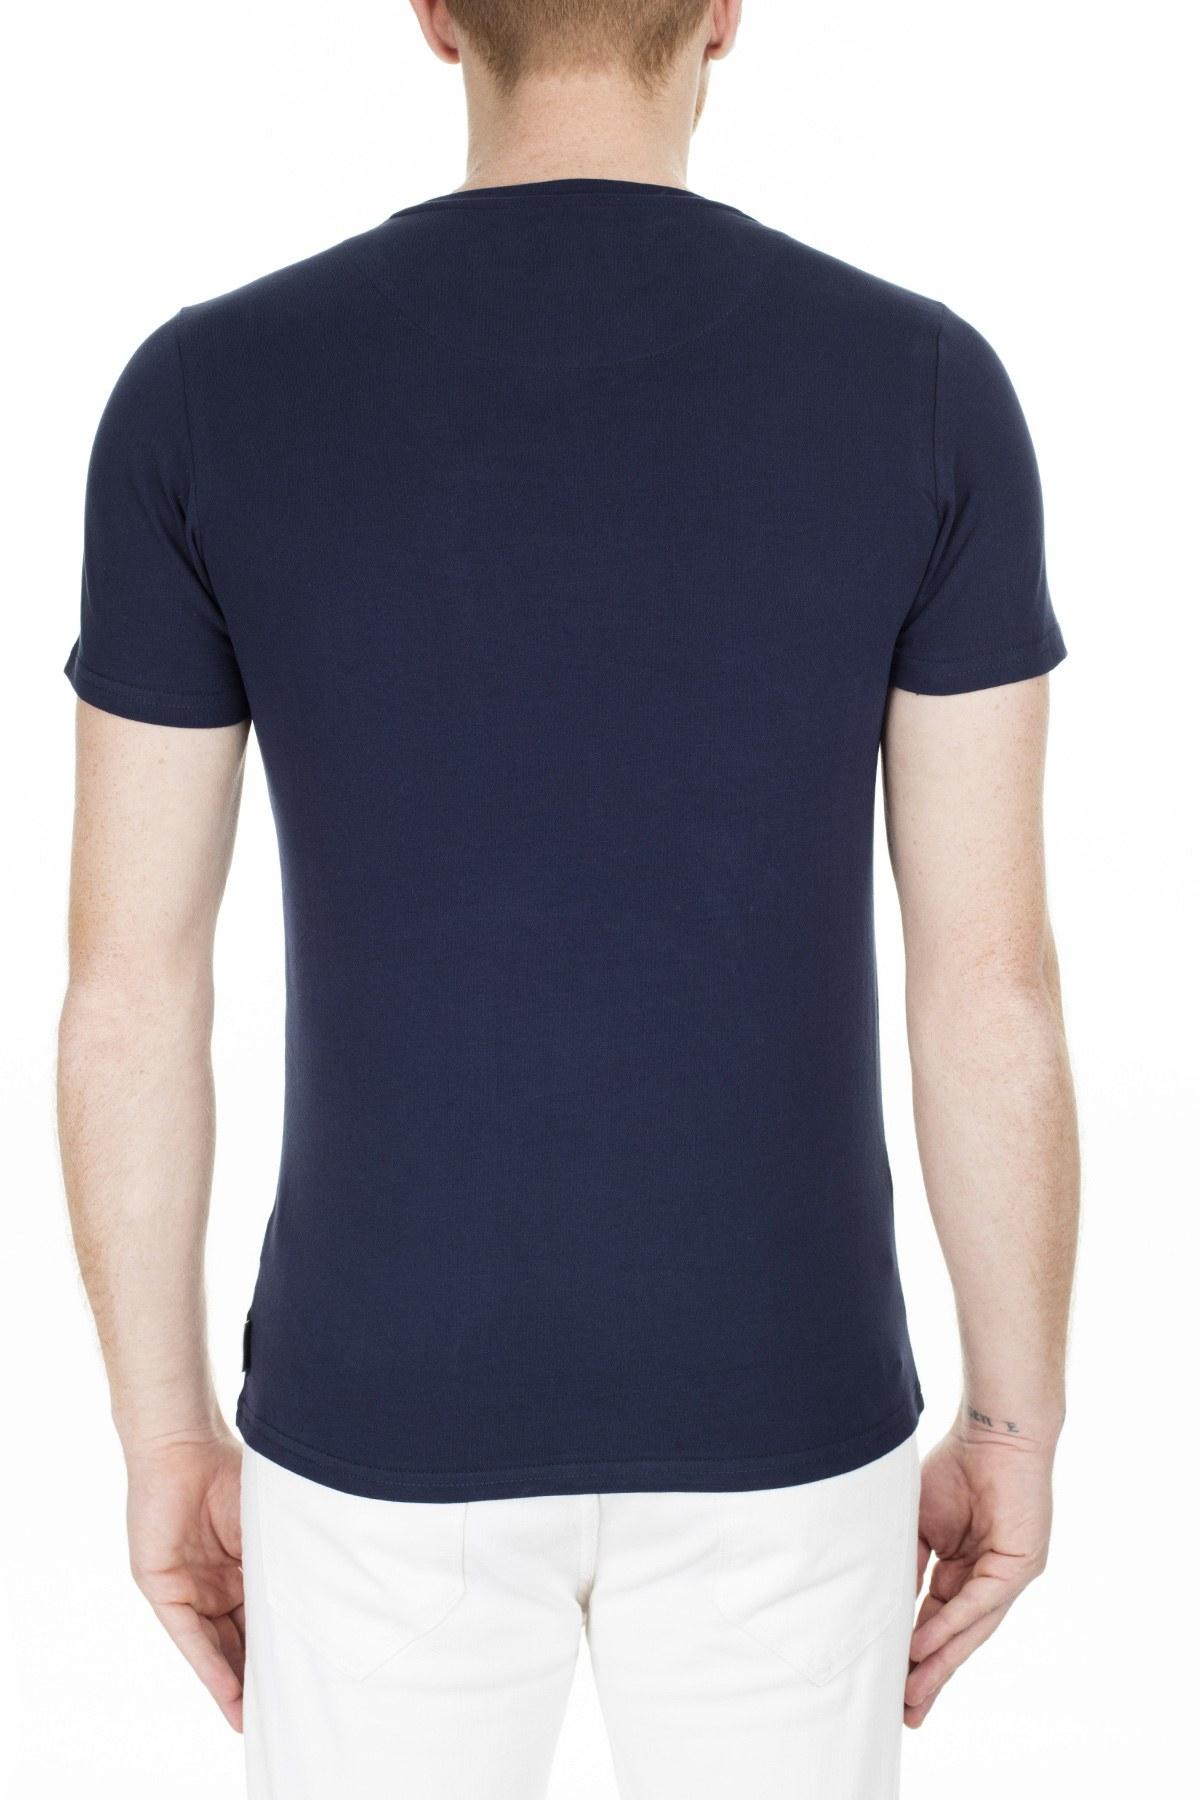 Cerruti 1881 Erkek T Shirt 203-001646 LACİVERT